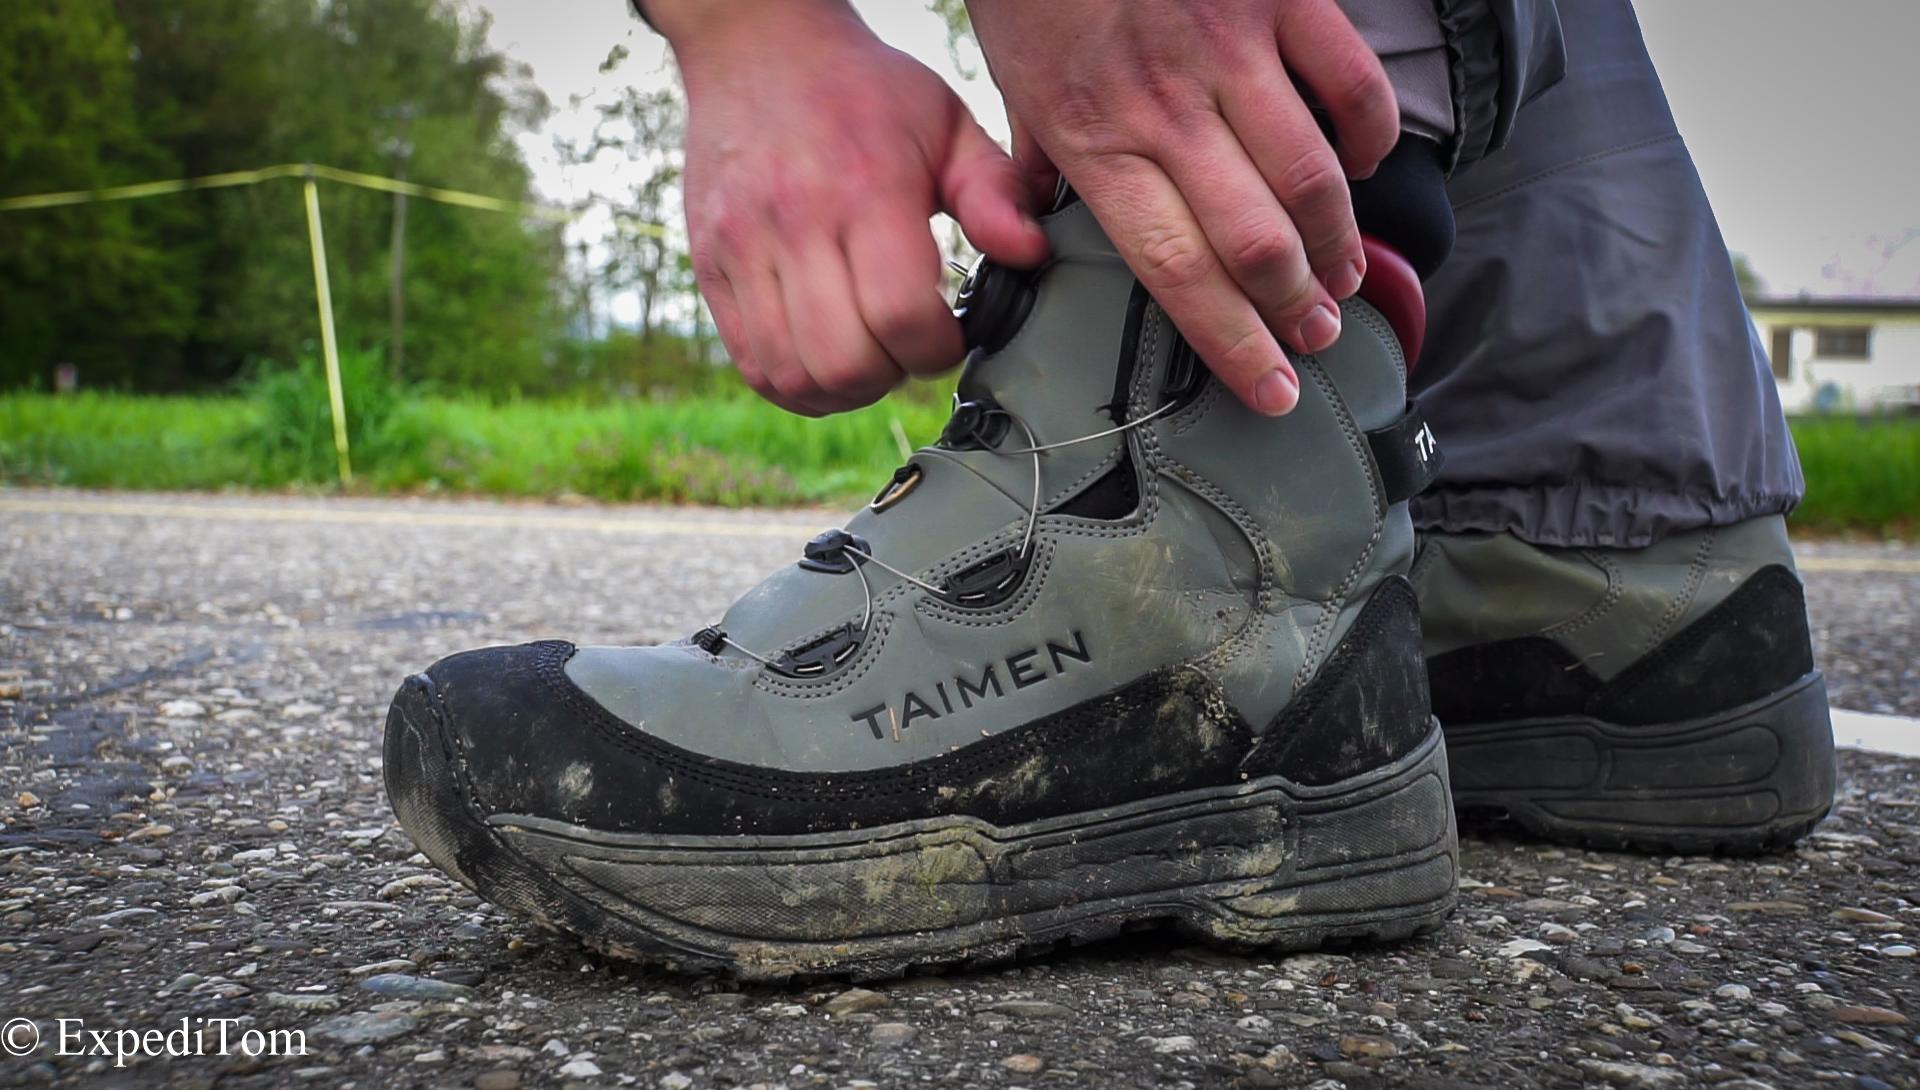 Taimen Khatanga Wading Boots Review